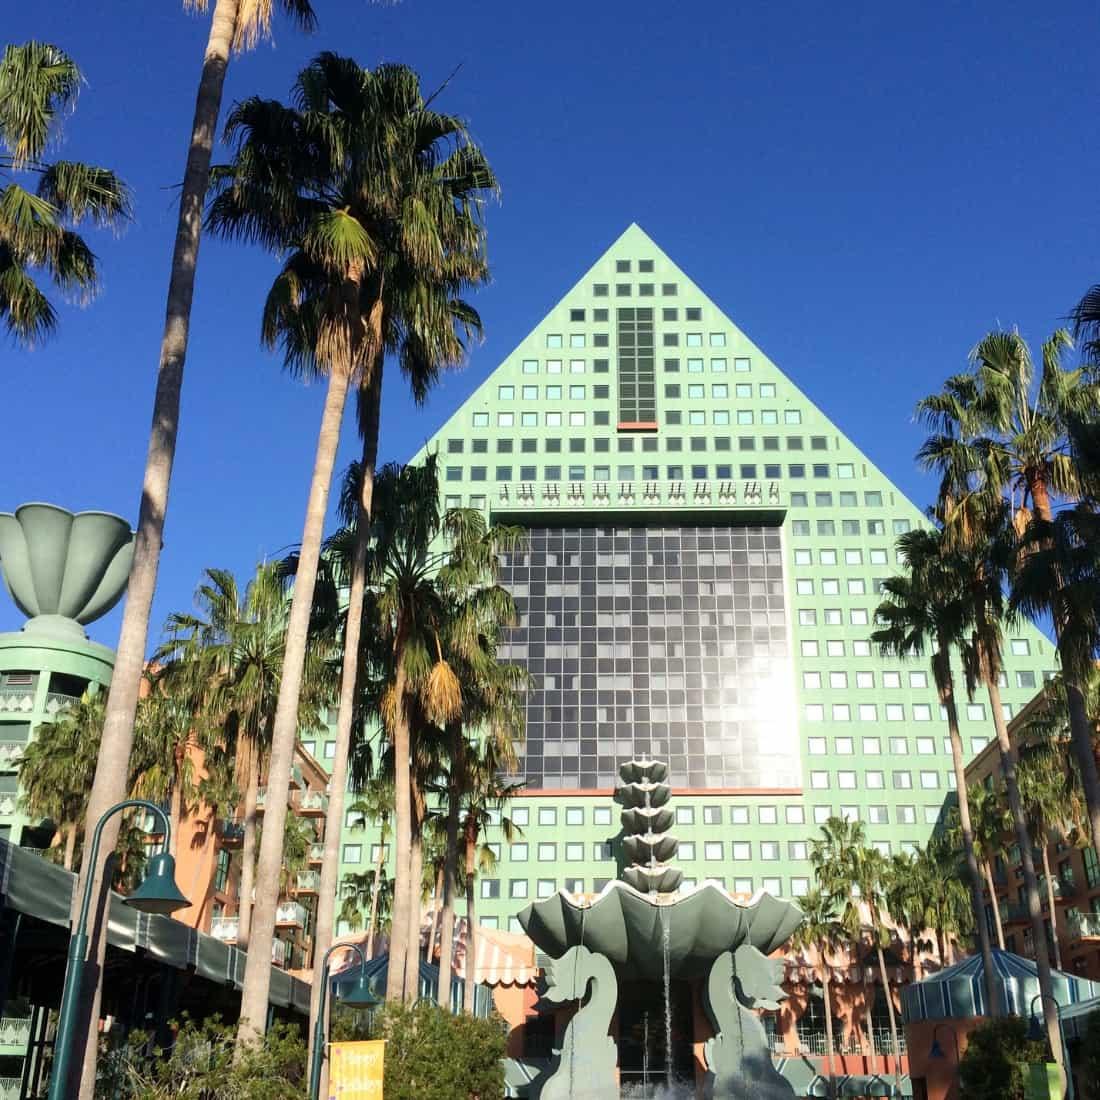 Best offsite Disney World hotel